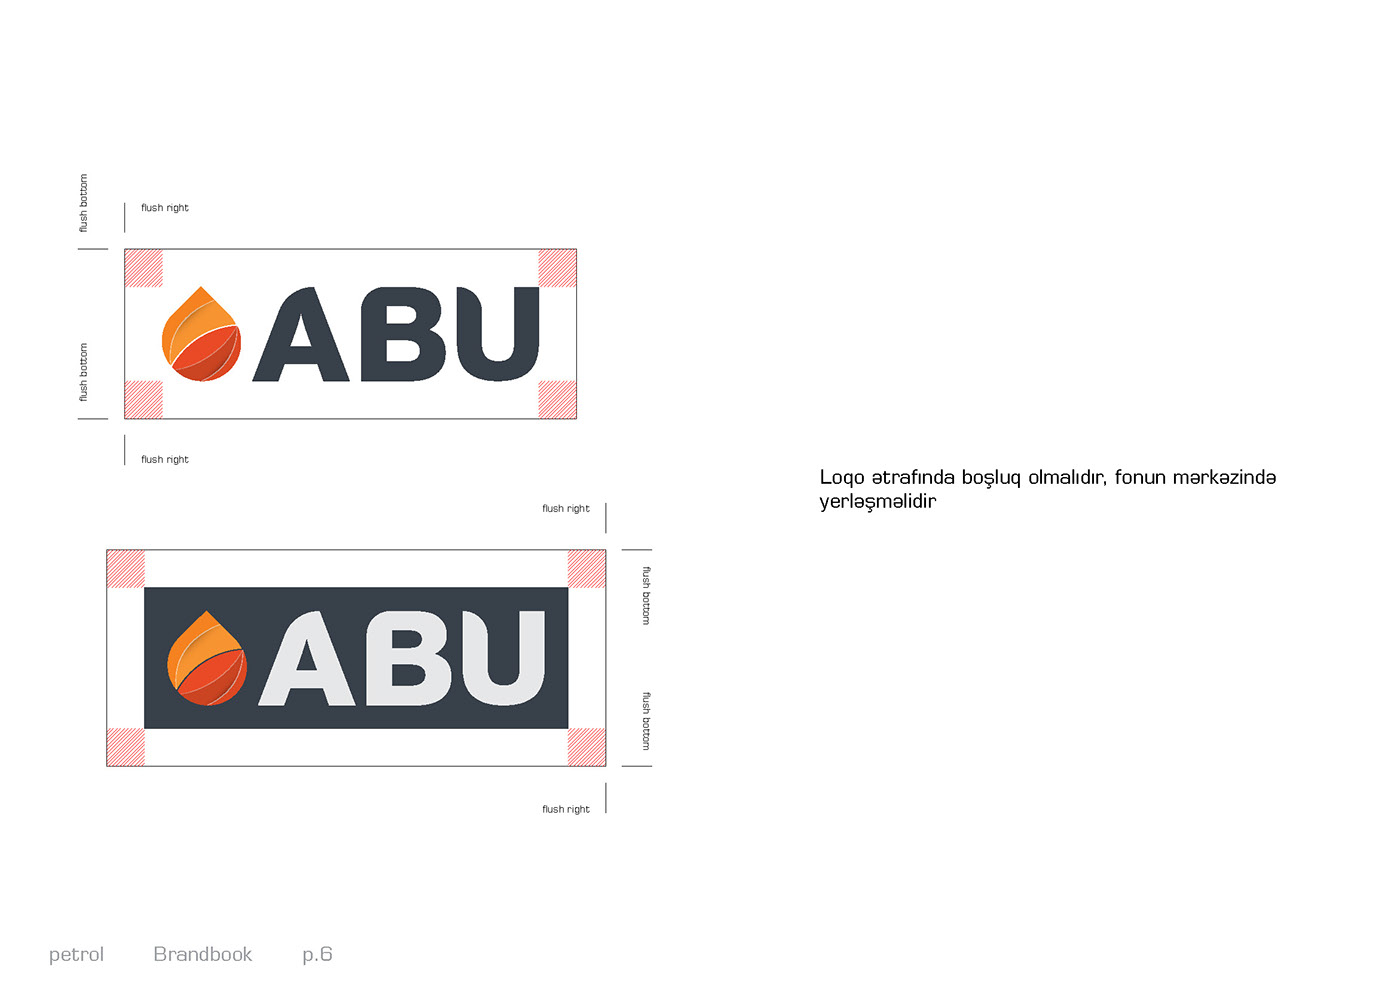 petrol oil logo baku azerbaijan fuel STATION abu abupetrol